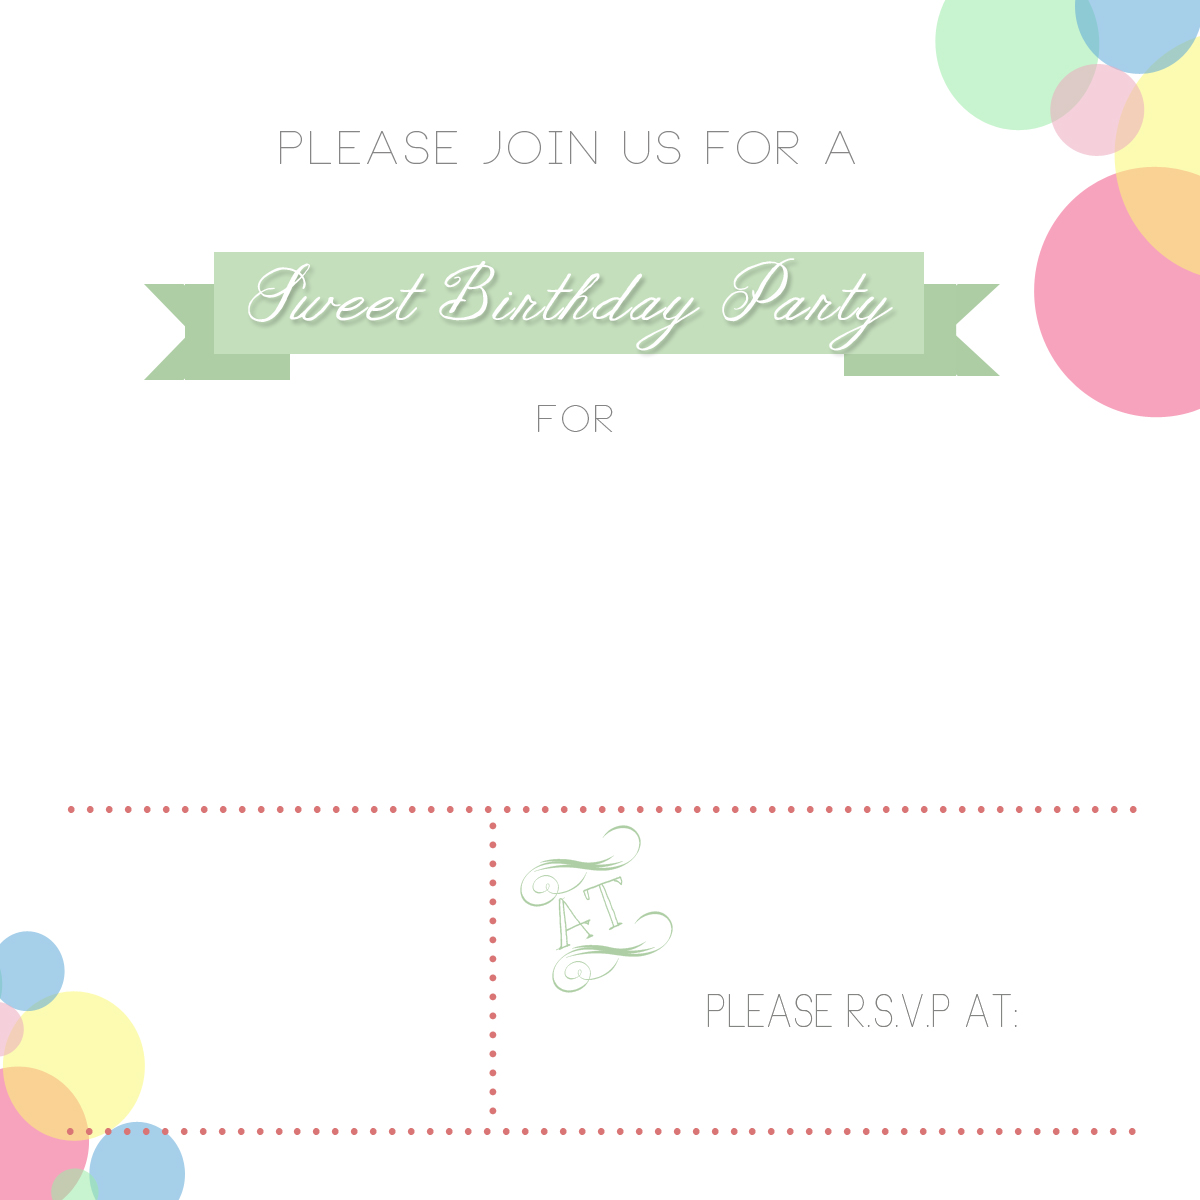 Email Invitation Template Plain